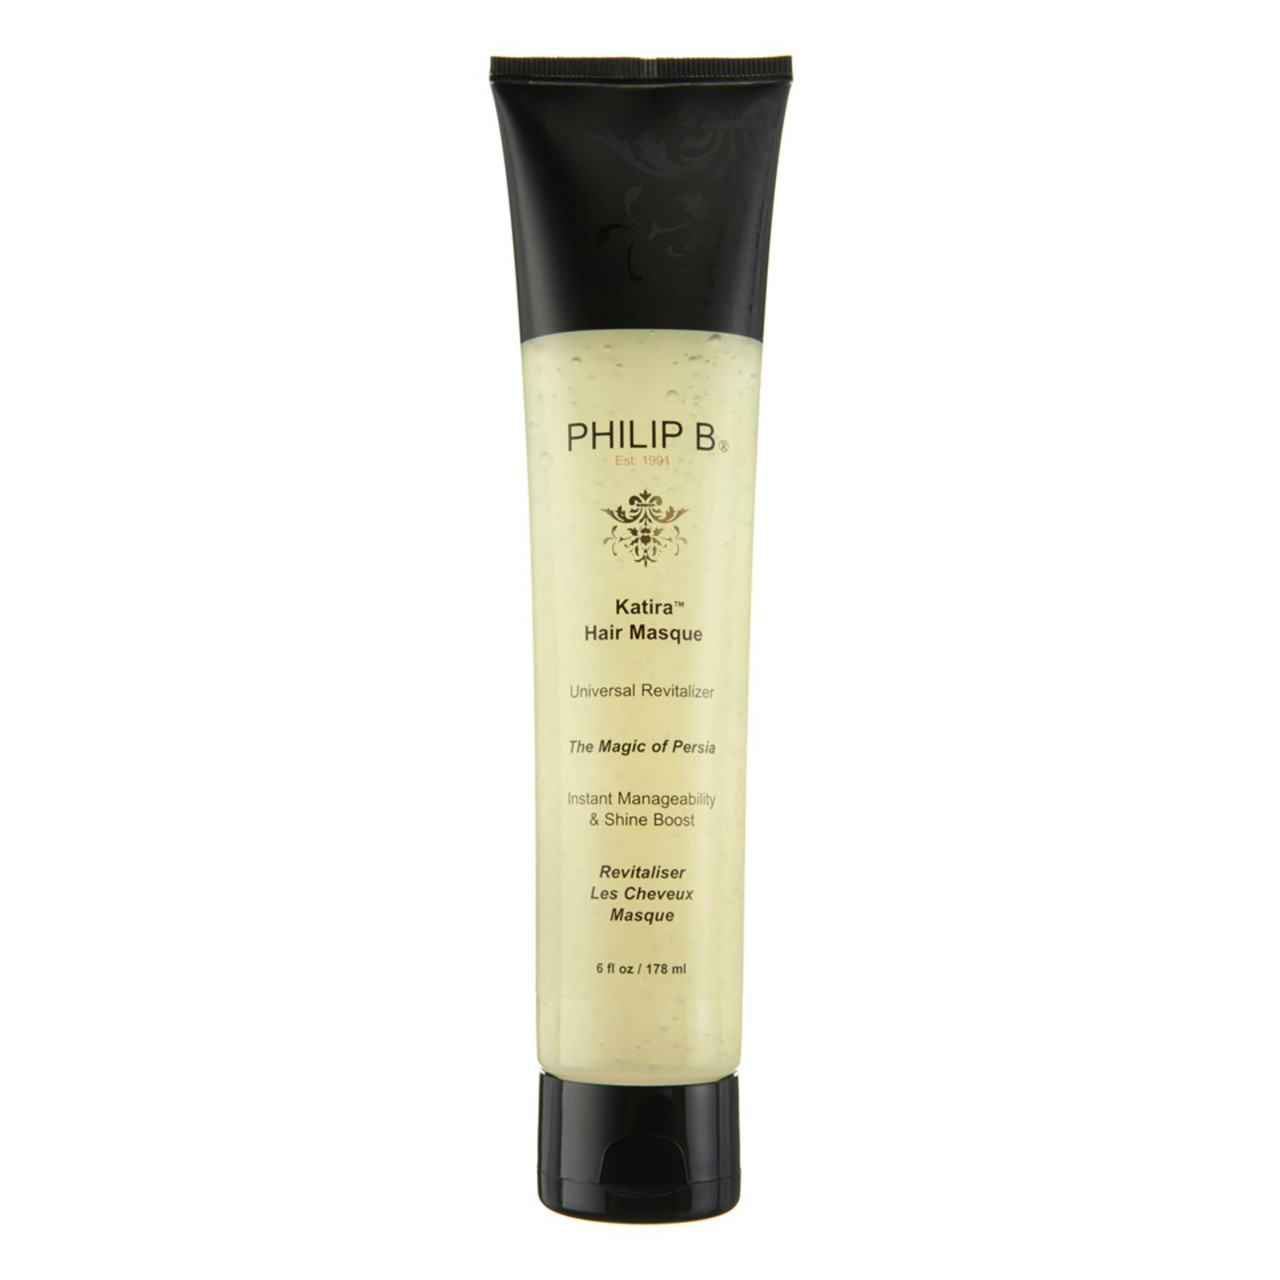 Philip B Katira Hair Masque 6 oz